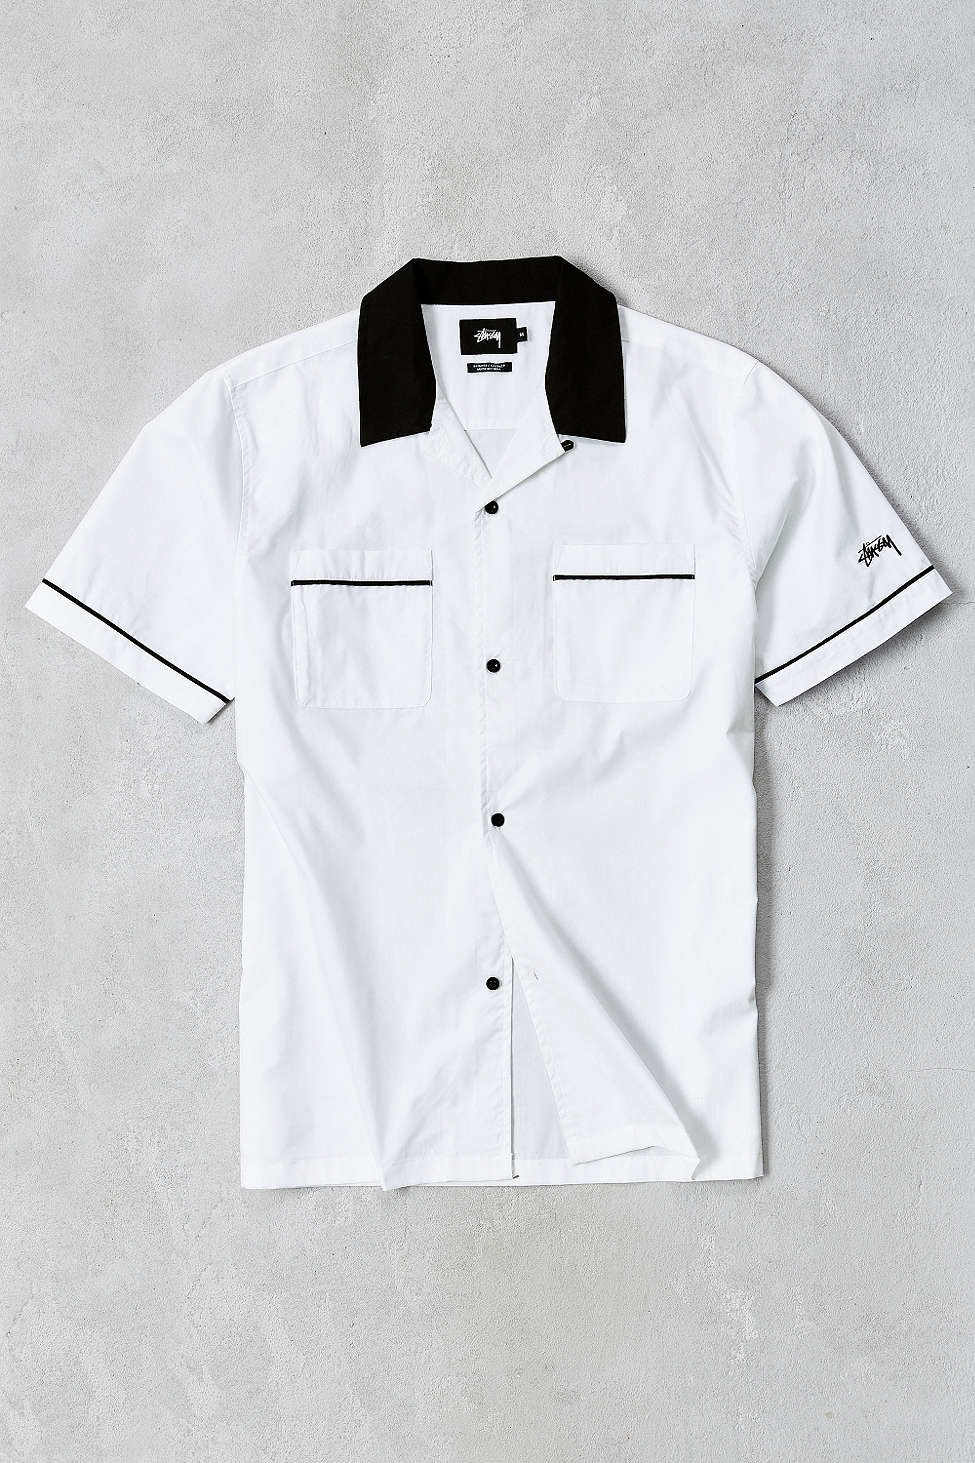 Stussy Shortsleeve Bowling Shirt in White for Men  Lyst